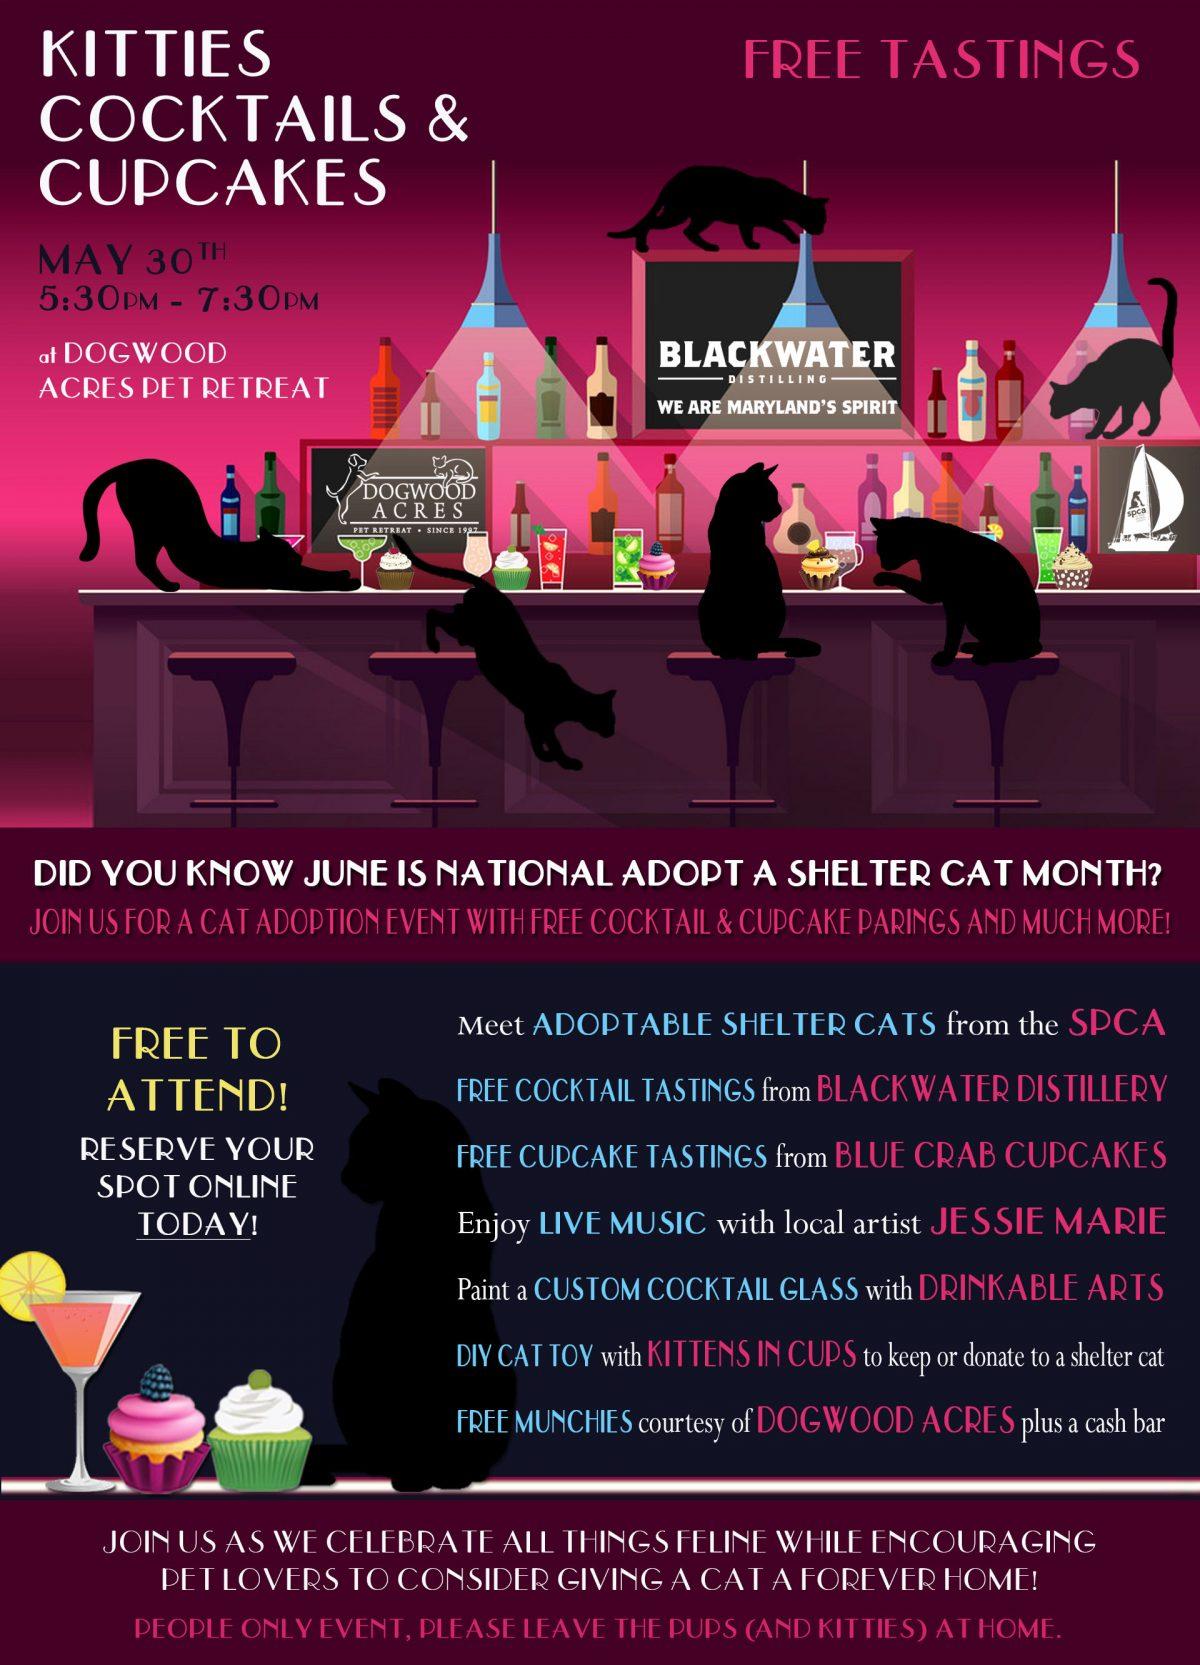 Kitties Cocktails Cupcakes -5/30